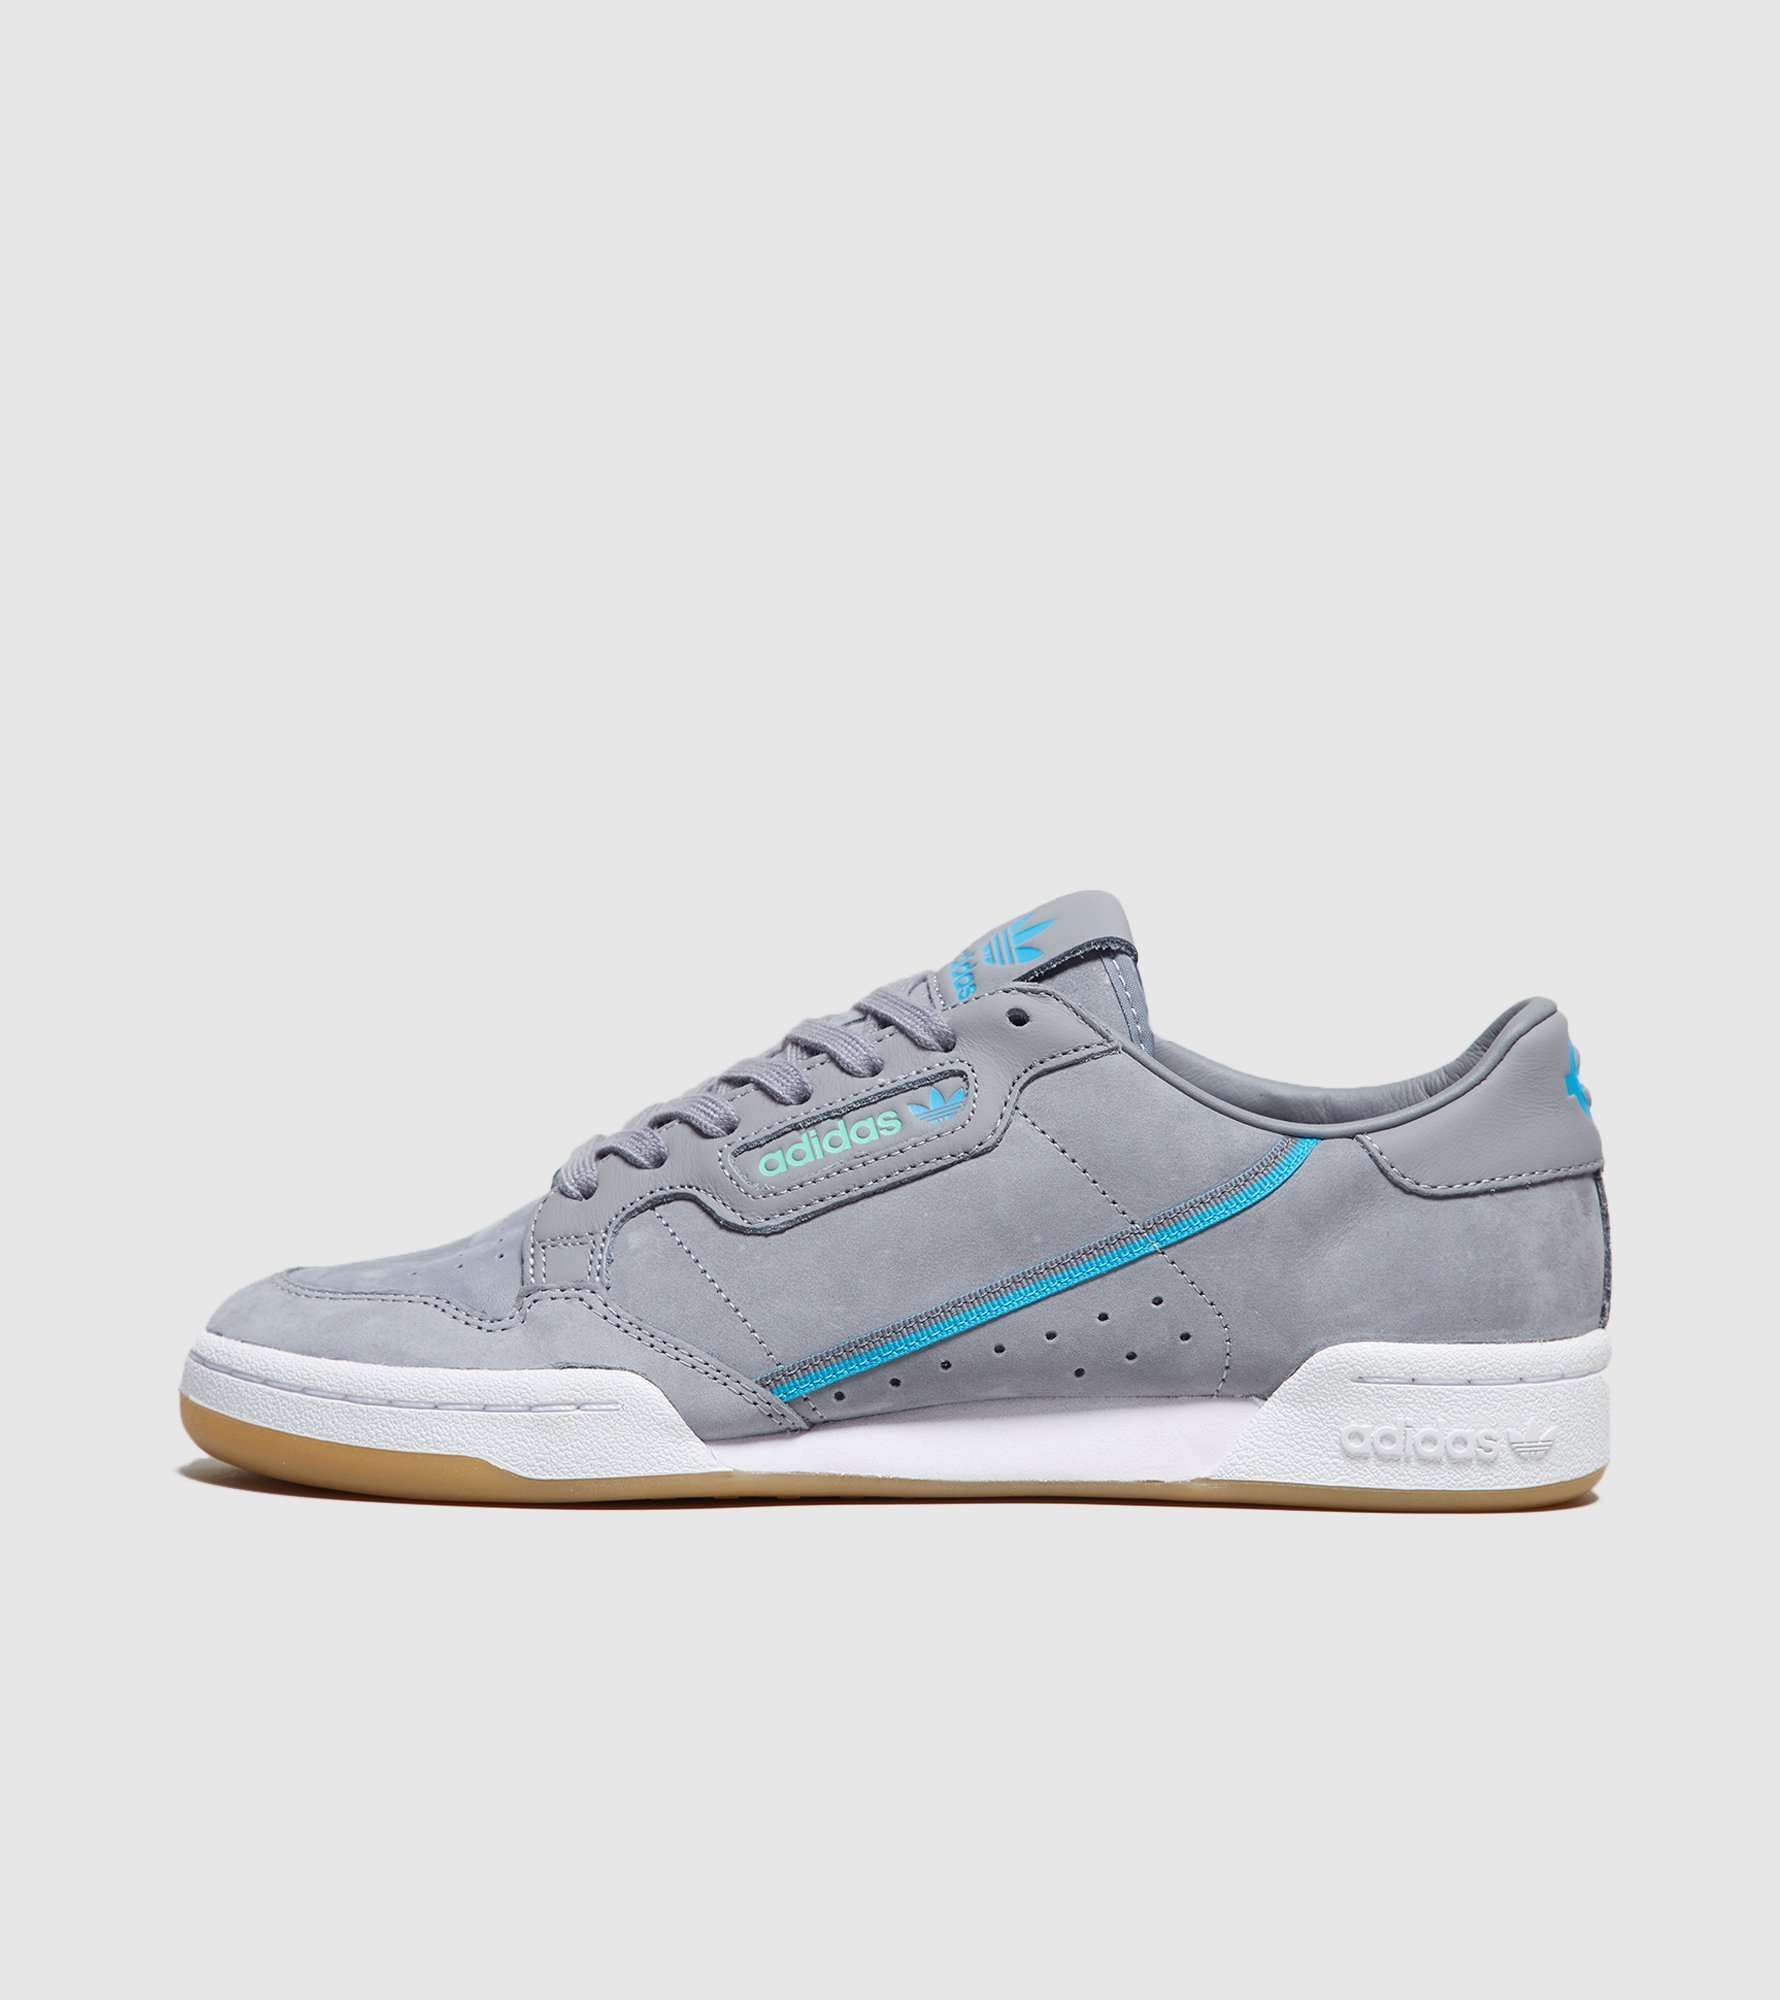 chaussures adidas waterloo